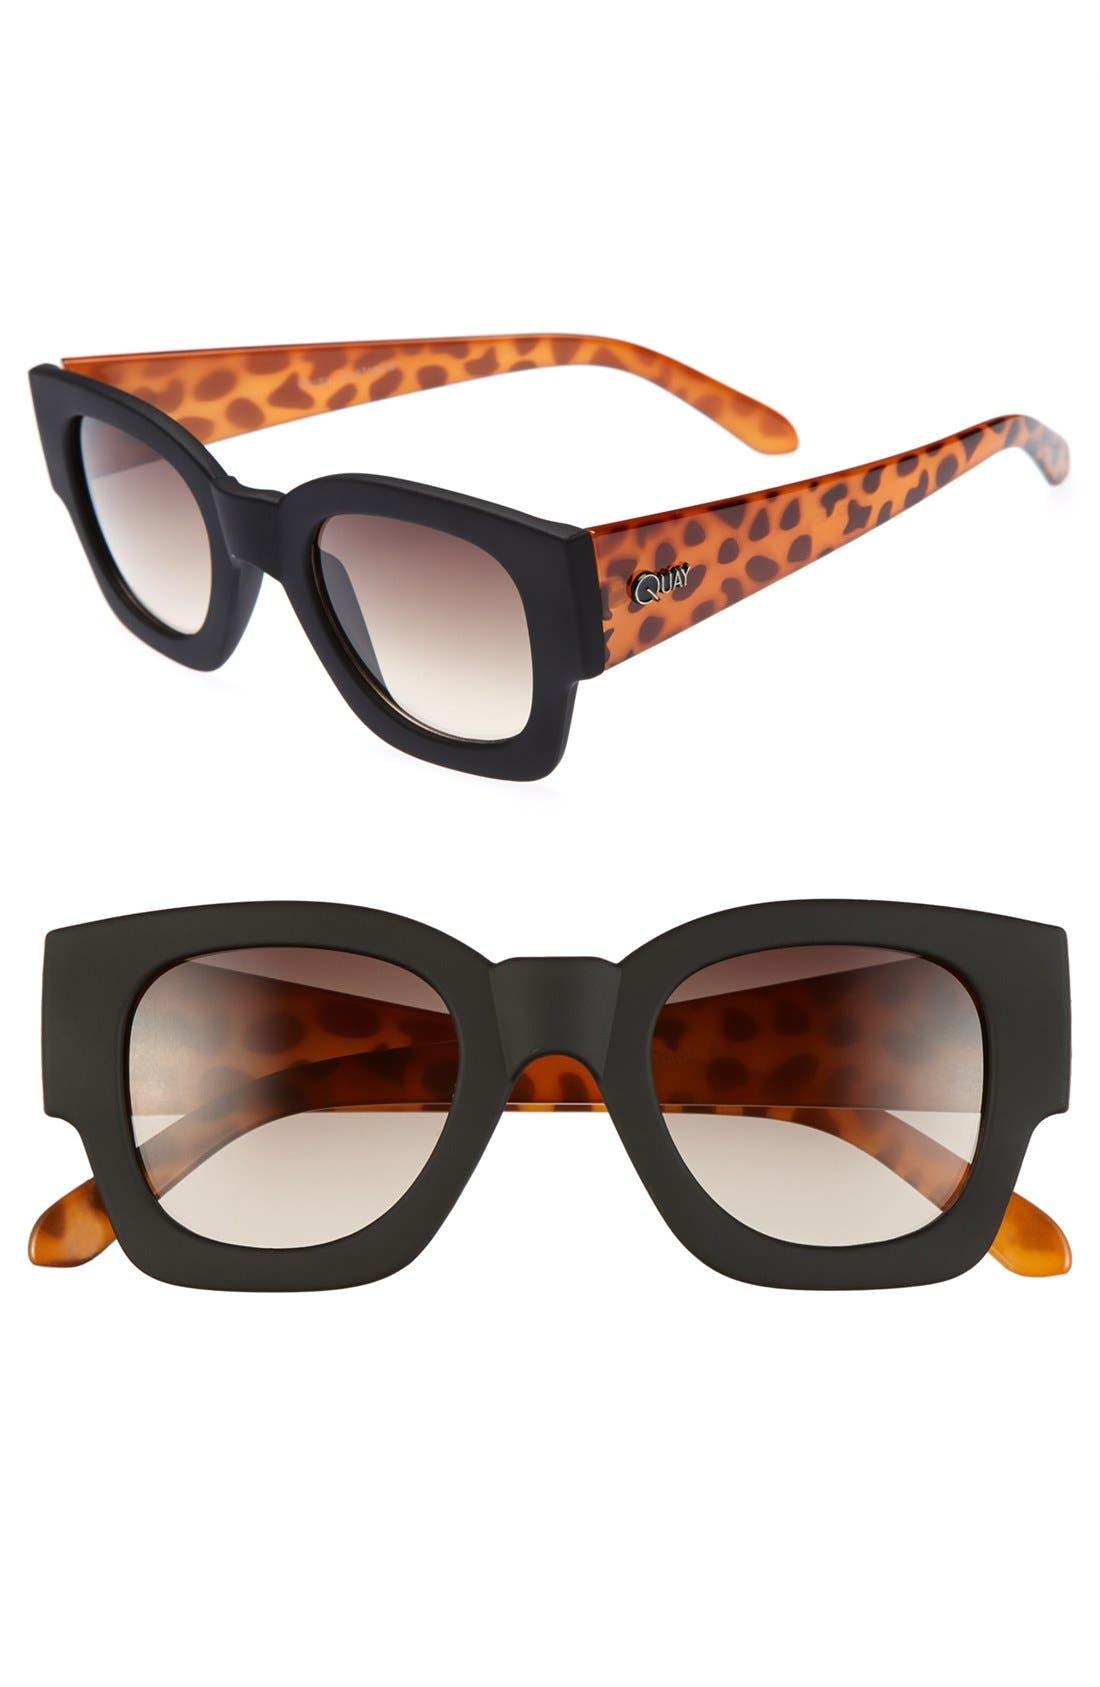 Alternate Image 1 Selected - Quay 'Polygon' 50mm Sunglasses